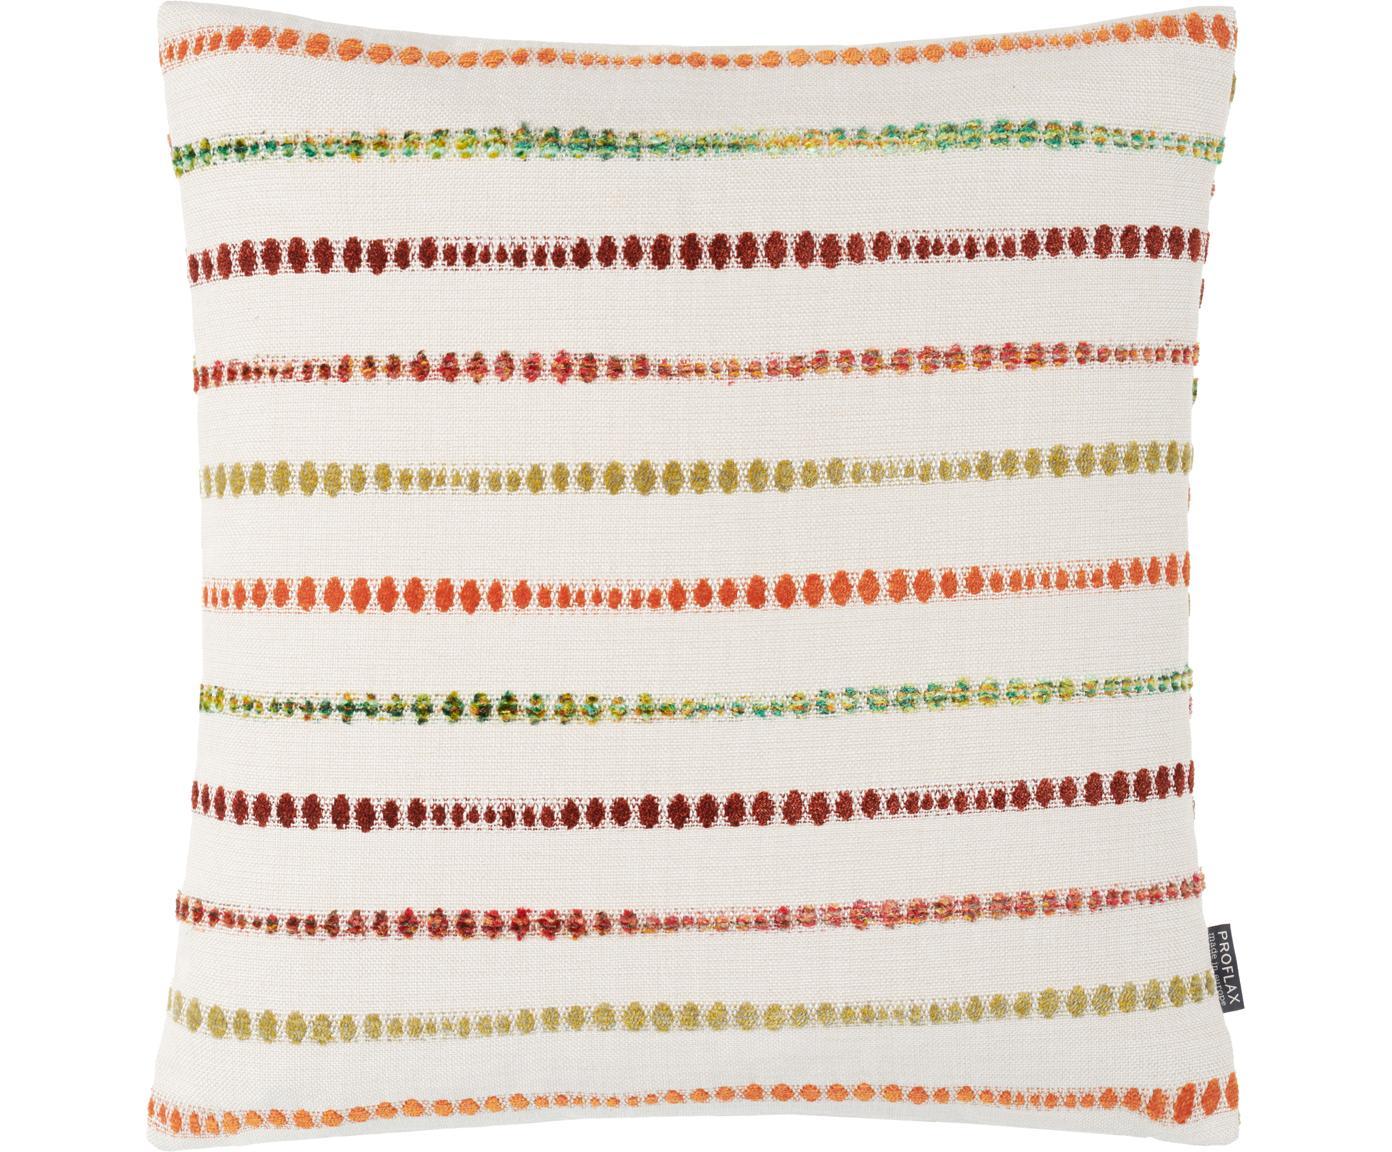 Kissenhülle Alfonso, 52% Polyester, 48% Baumwolle, Weiß, Mehrfarbig, 45 x 45 cm